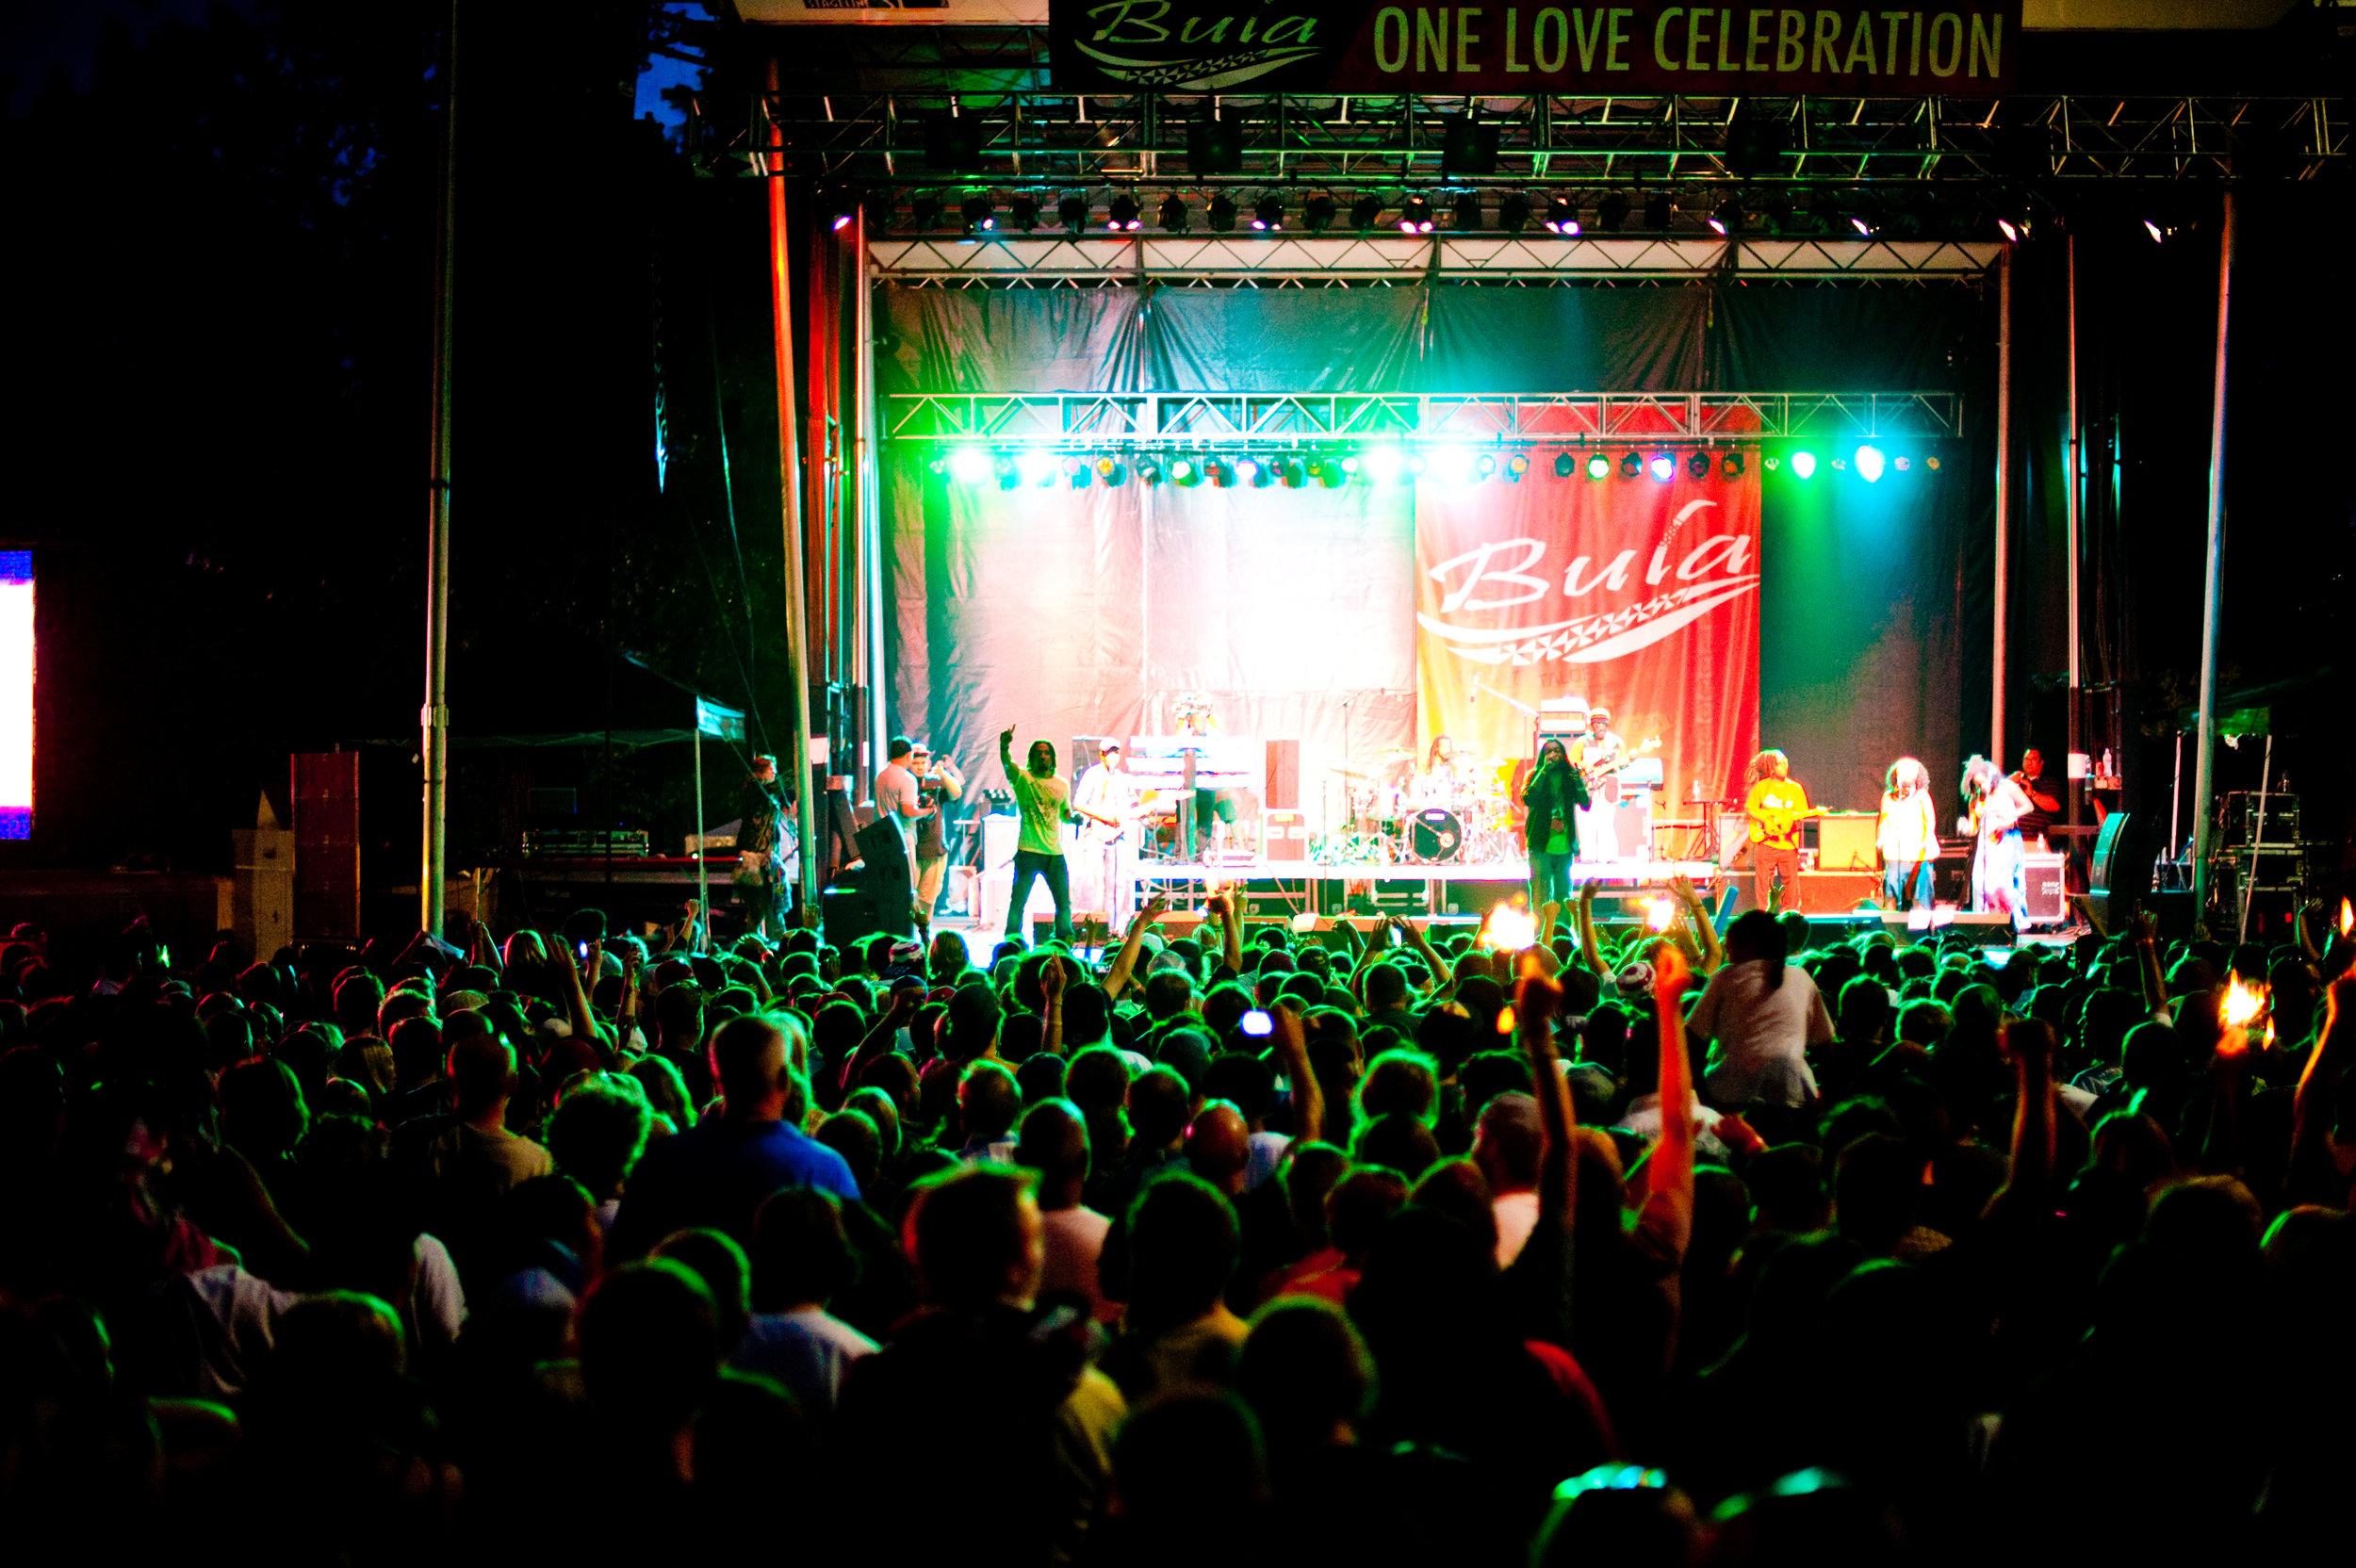 Bula One Love Celebration 2011